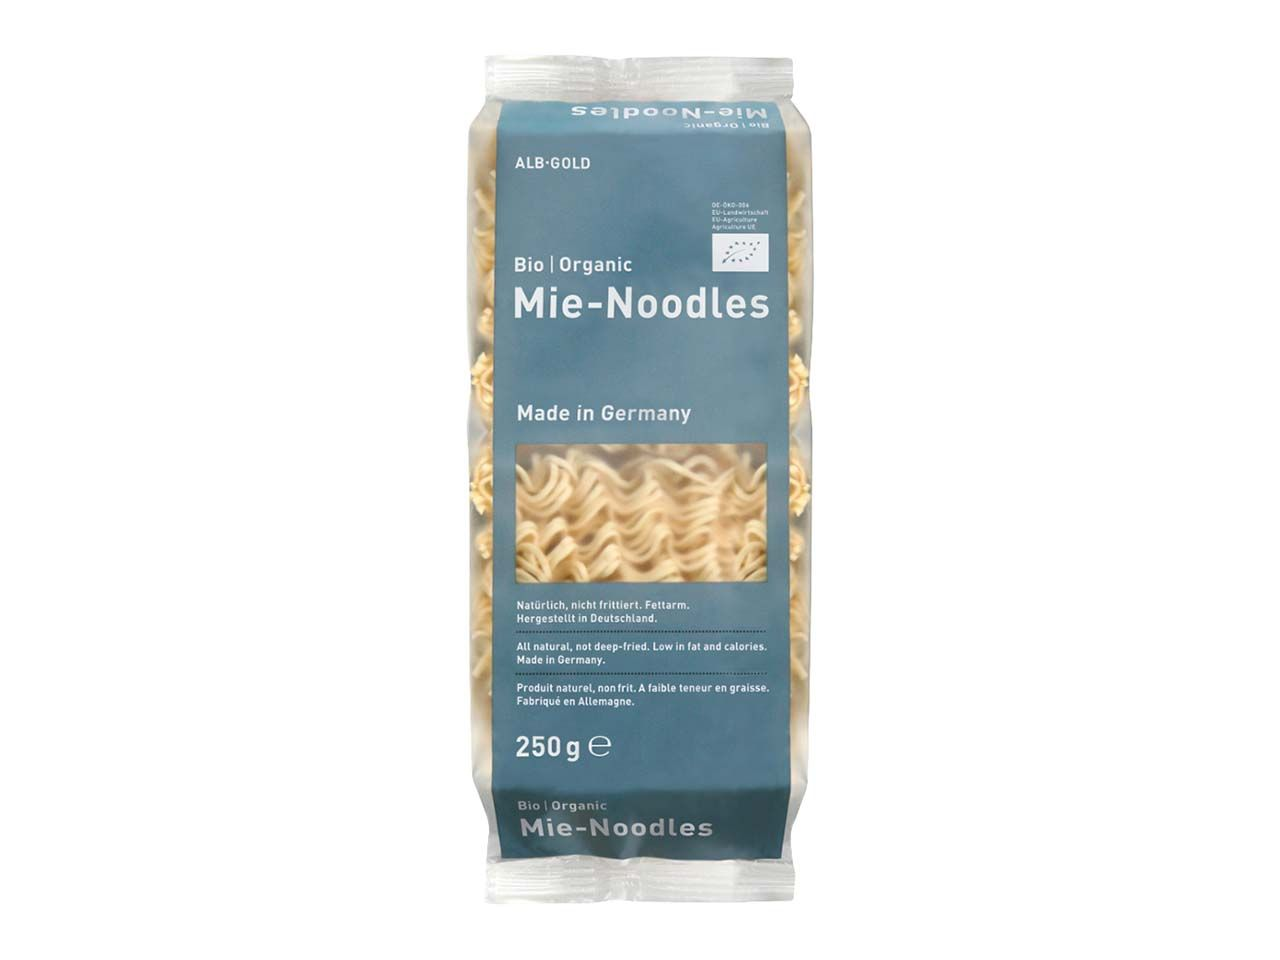 ALB-GOLD Bio-Mie-Nudeln, 250 g 104030569